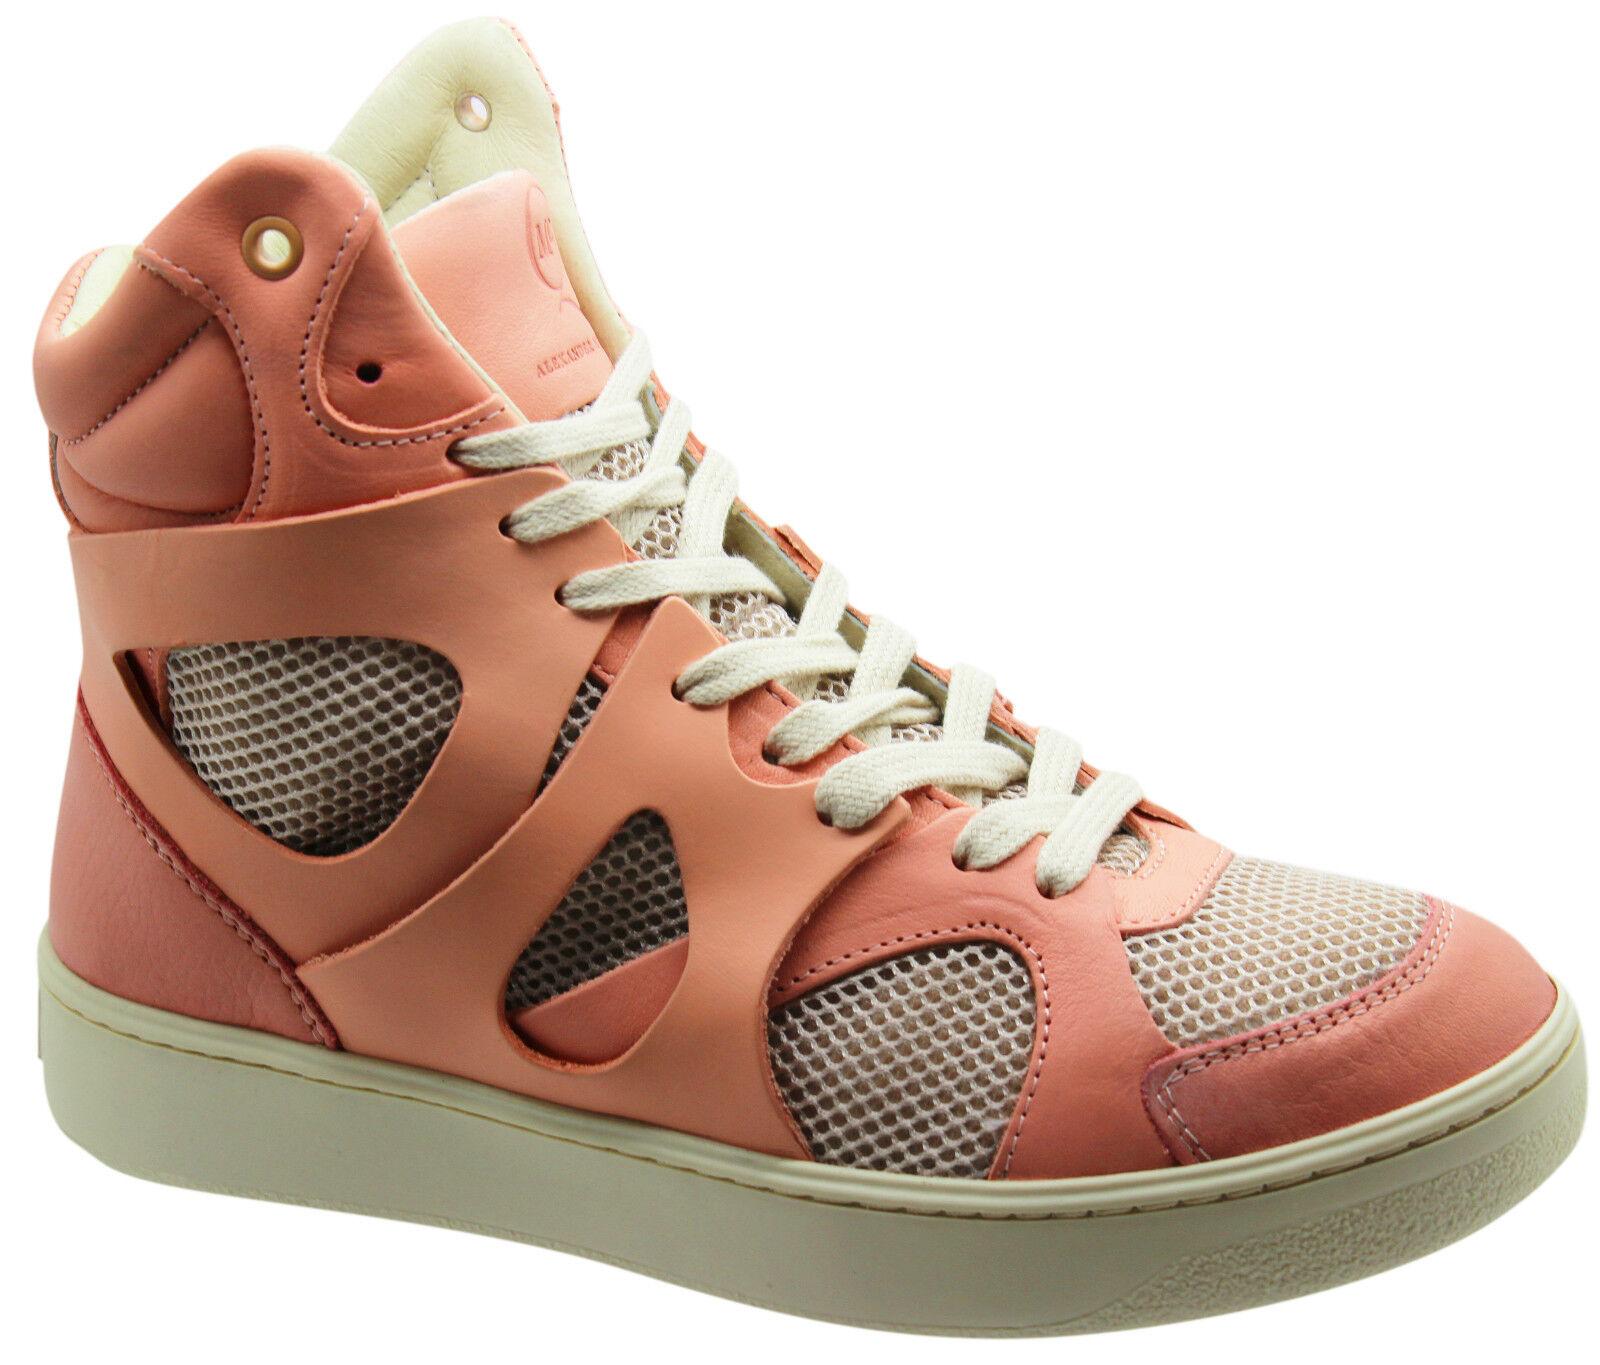 Puma Amq Alexander Mcqueen Move Medio da women shoes Ginnastica pink 357165 03